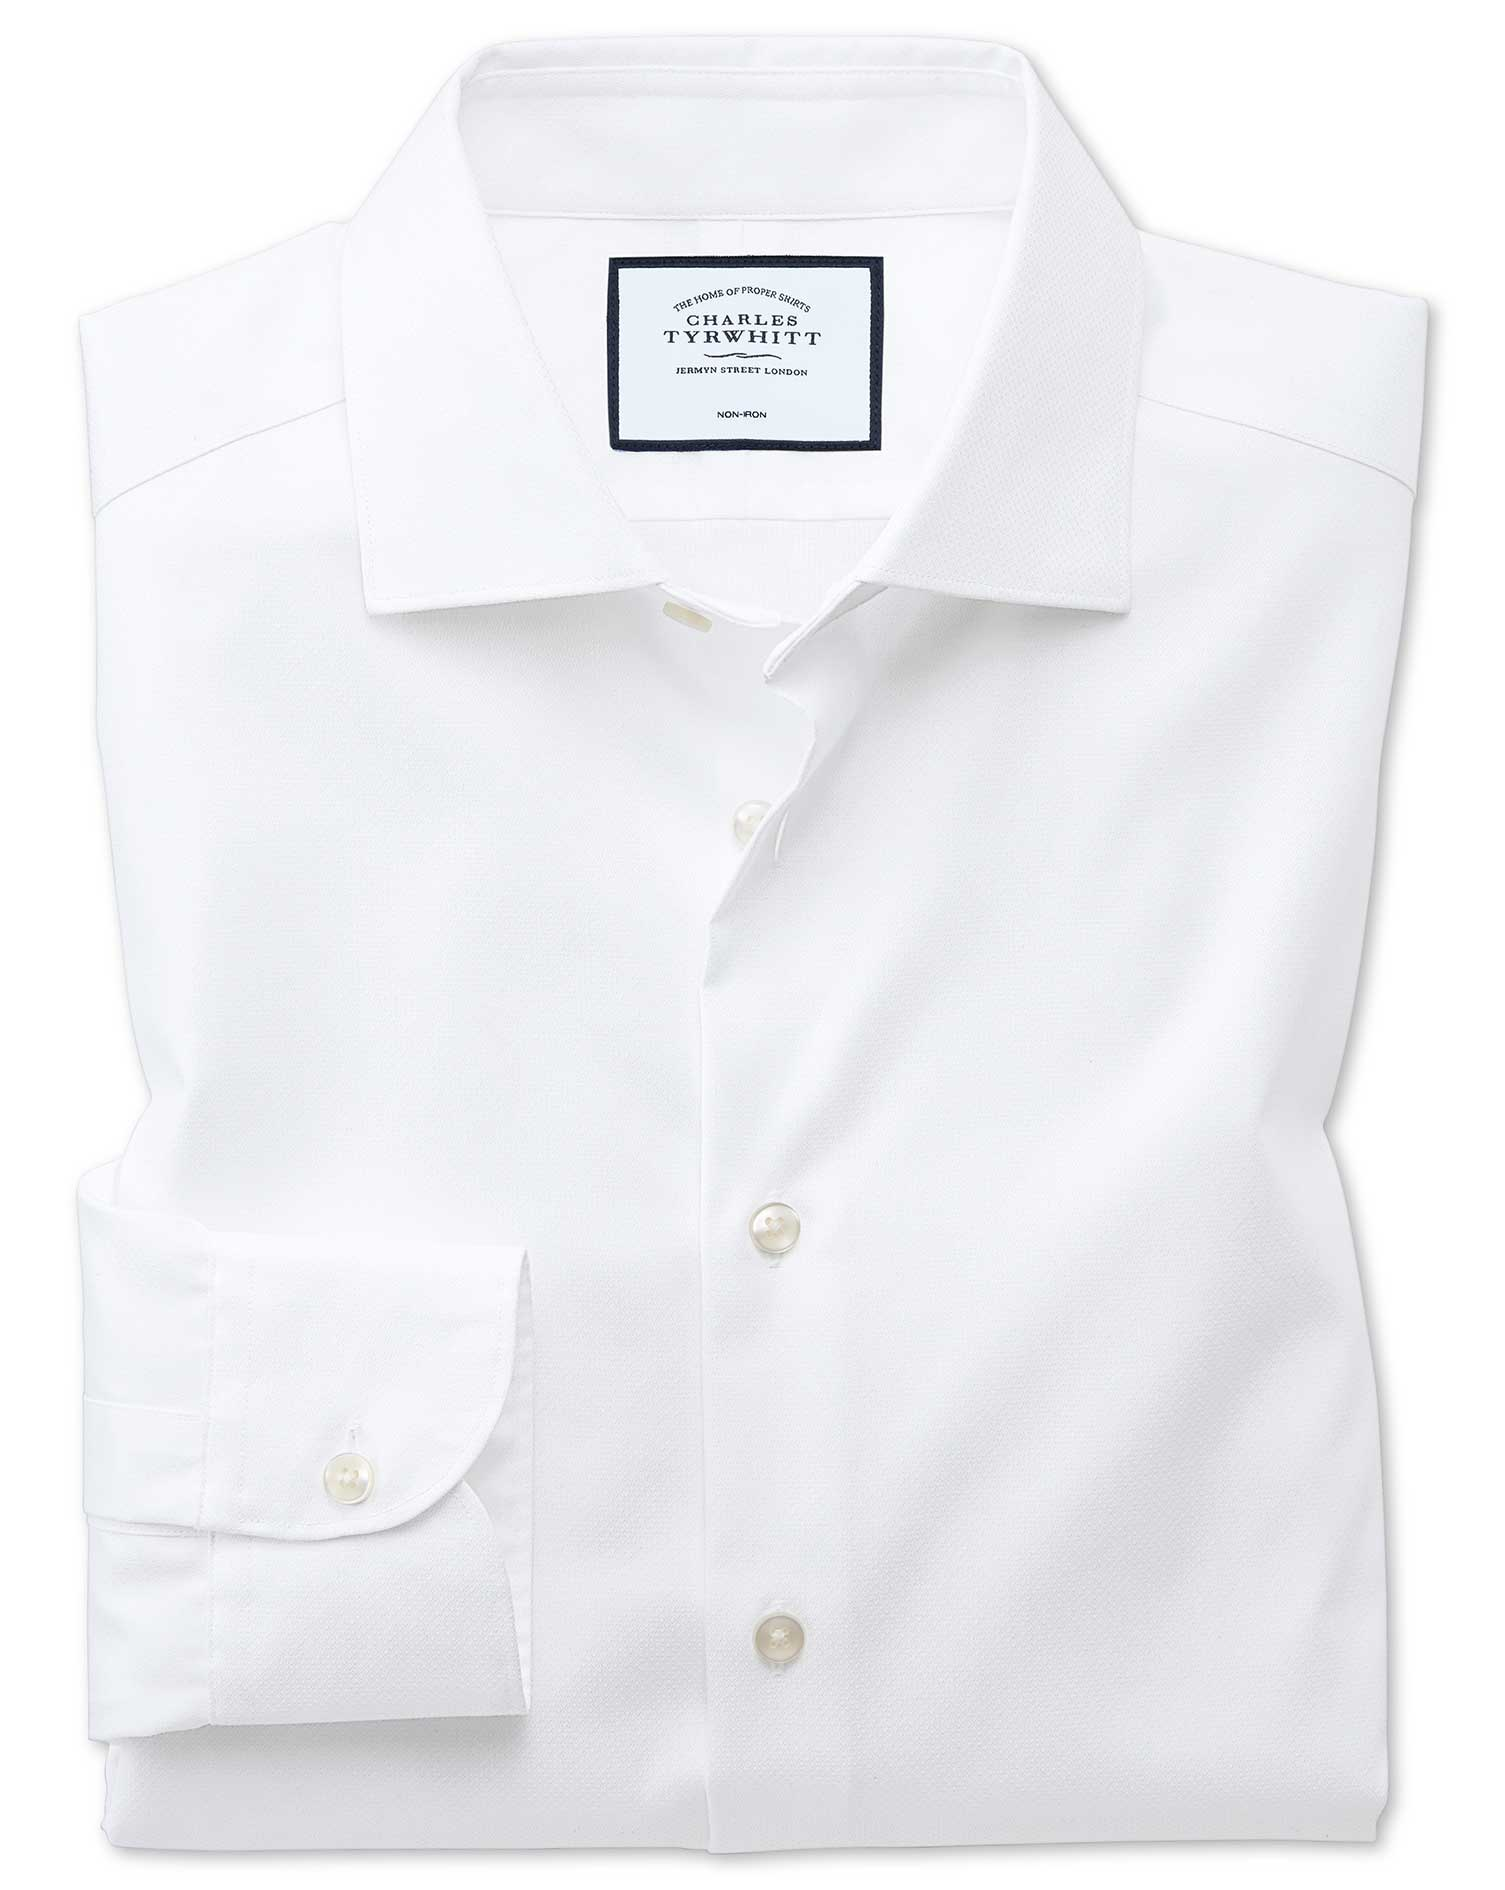 b859ded0 Slim fit business casual non-iron modern textures white shirt | Charles  Tyrwhitt